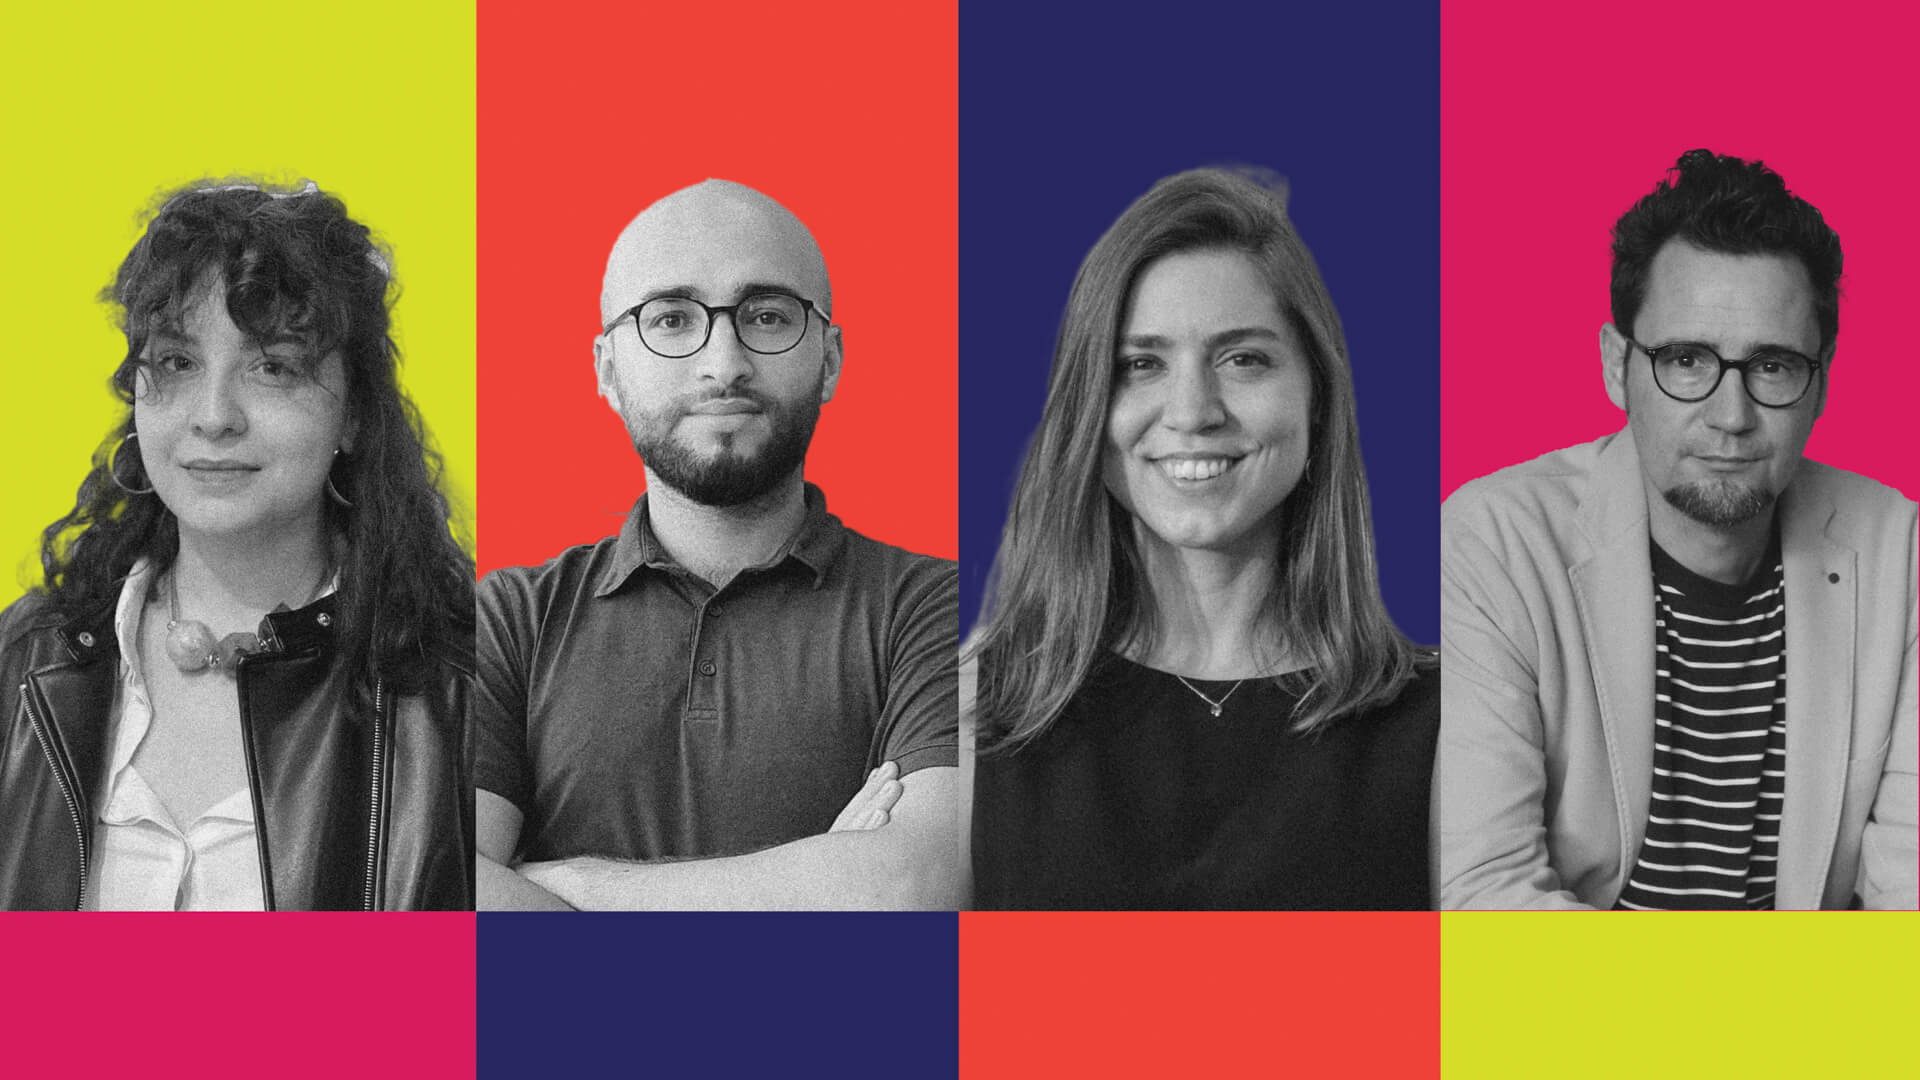 A Young Perspective on Arts and Cultural Management <br> Esra Özkan, Halil Yıldırır, Eda Göknar, Marcus Graf